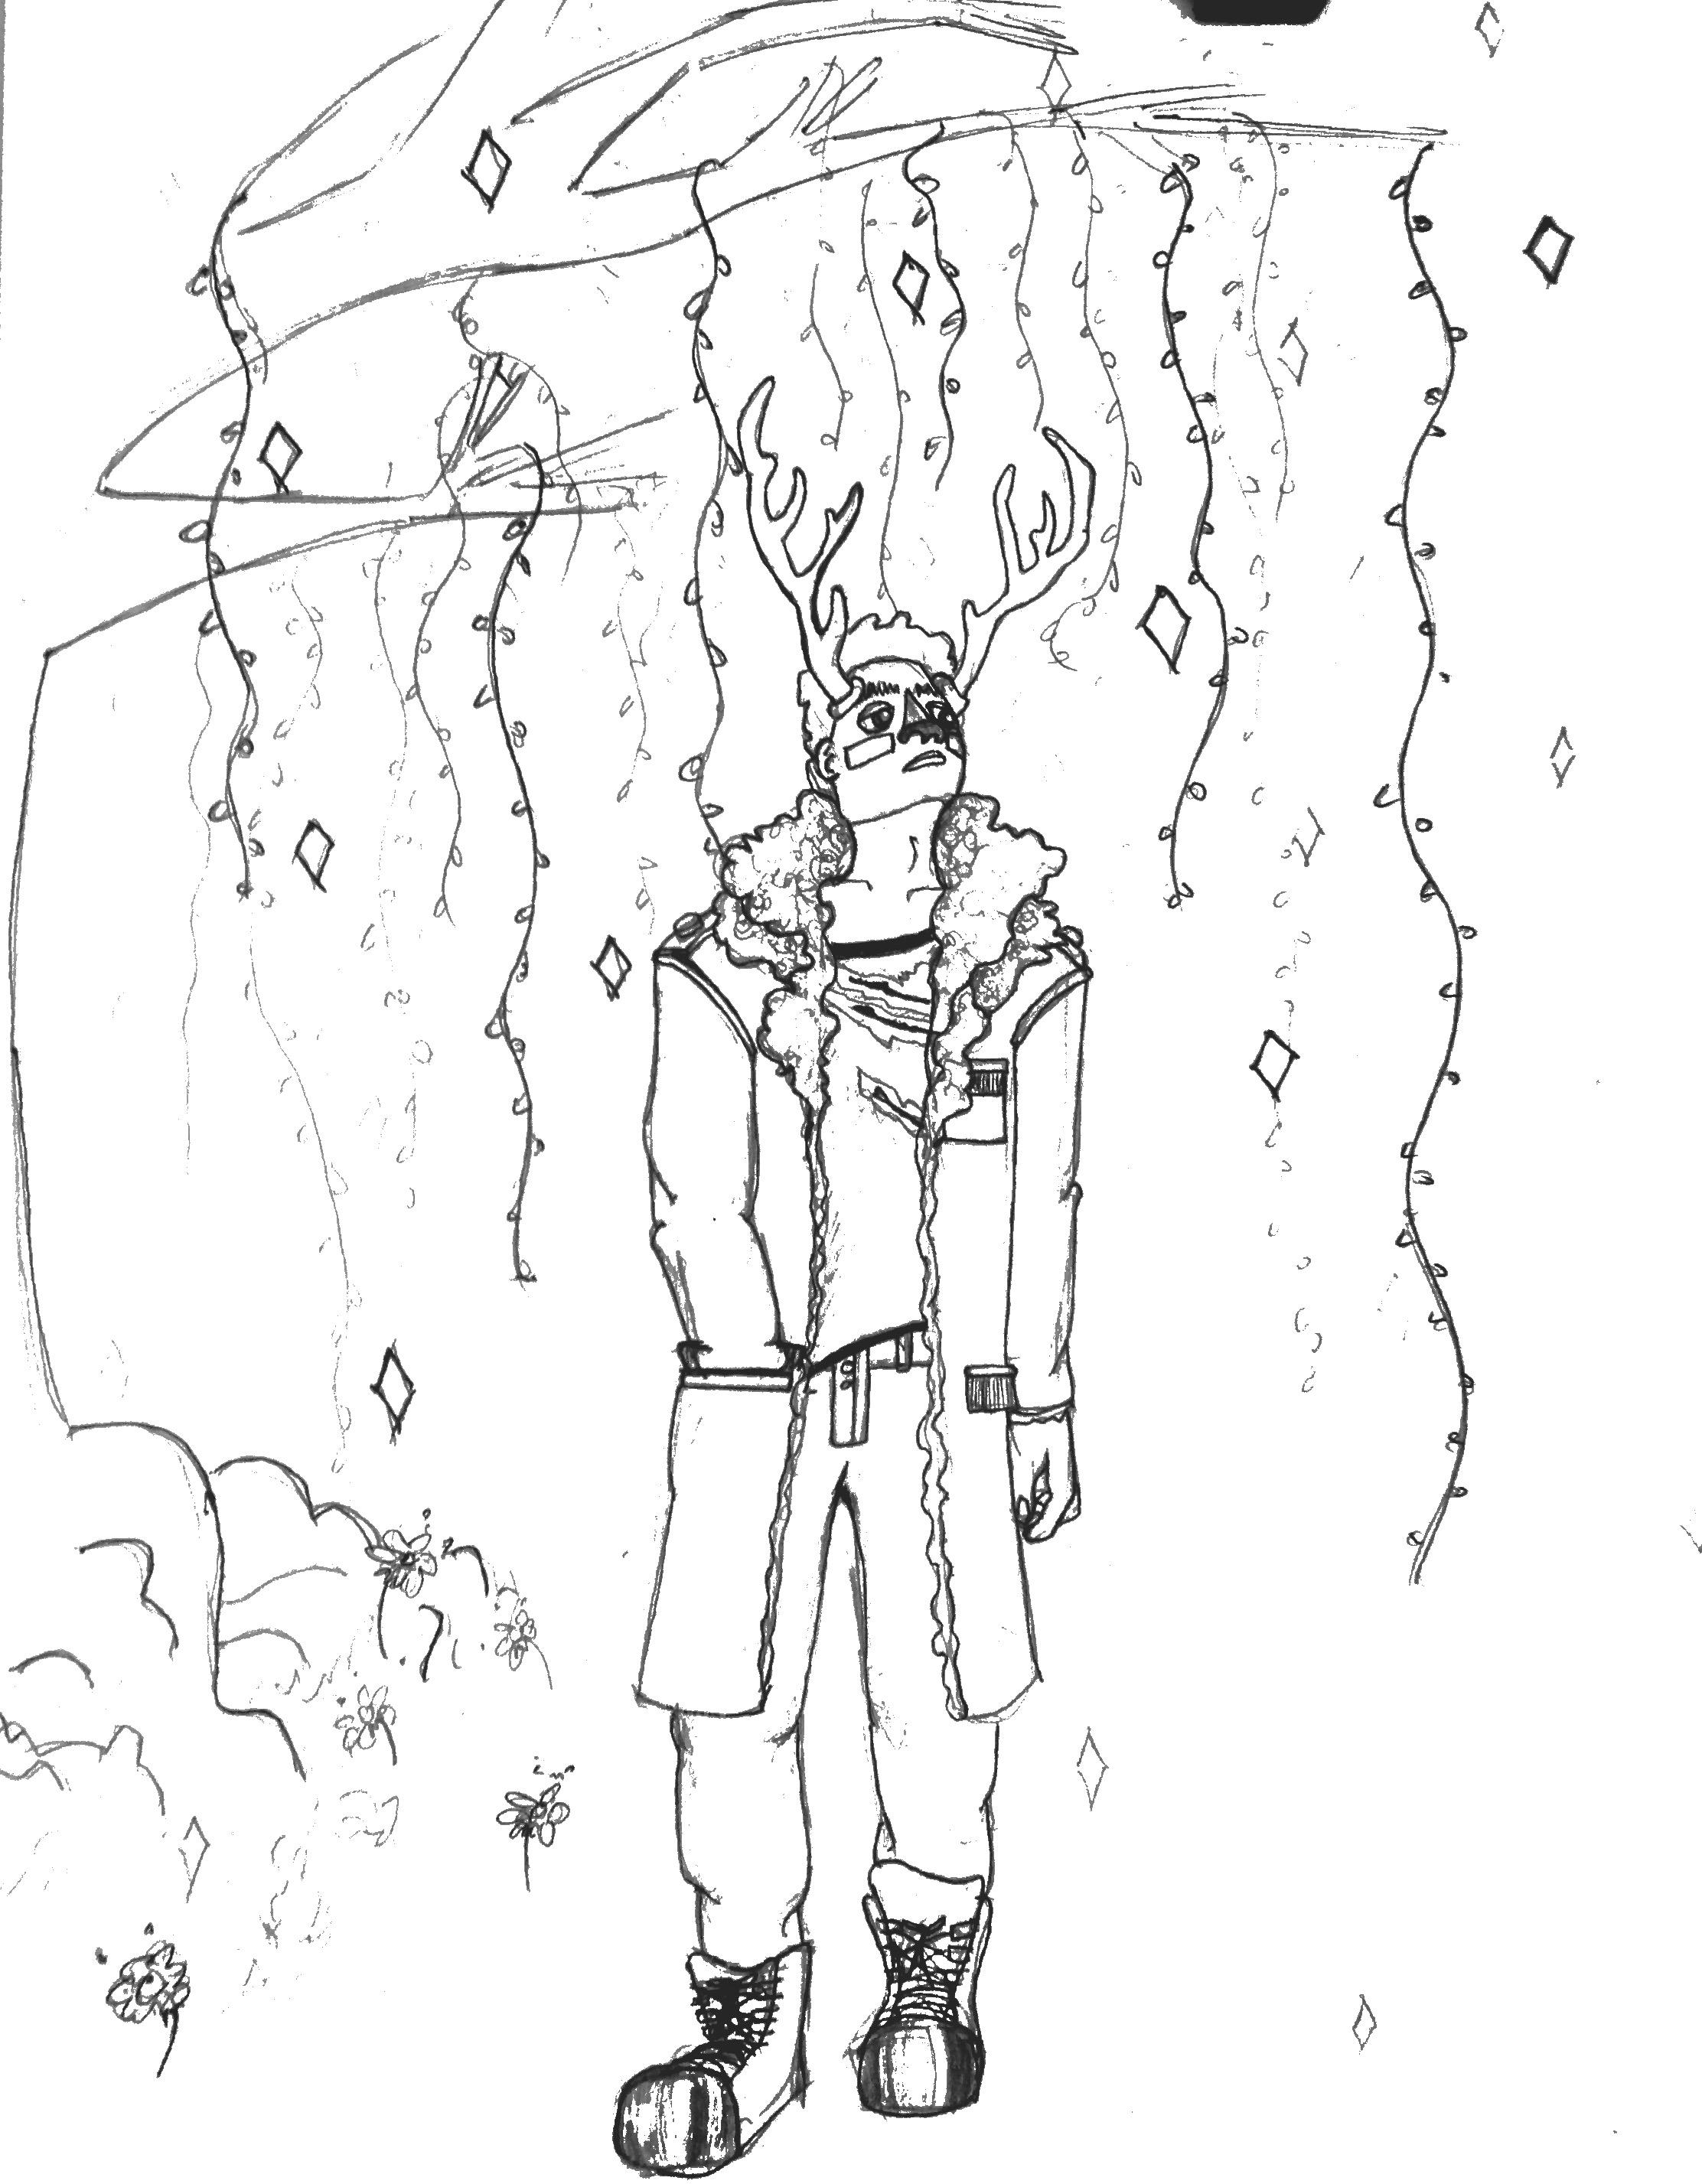 Gabe drawing.jpg